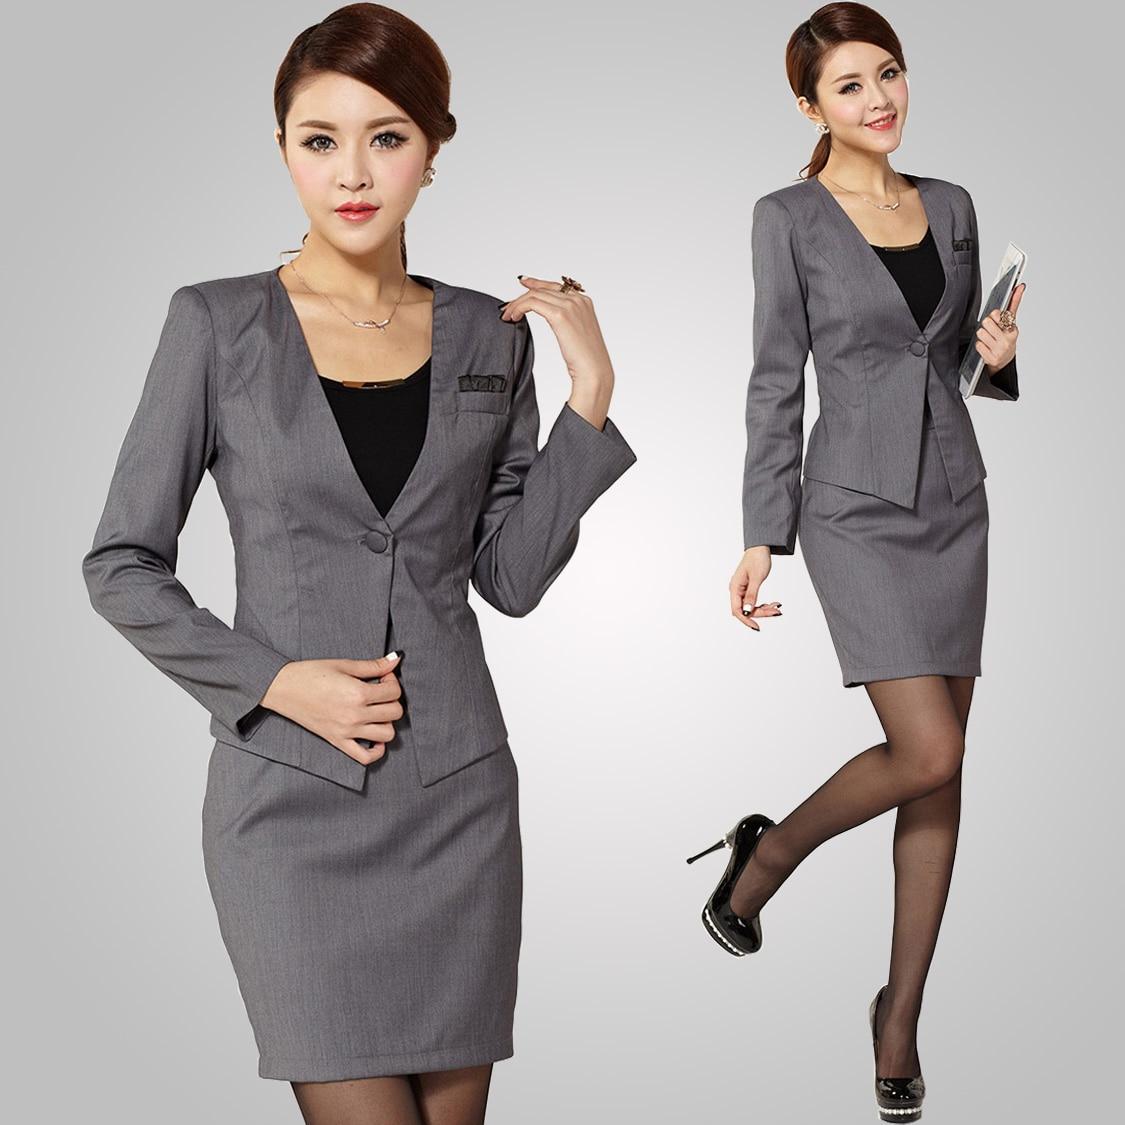 Business Winter Formal Dresses